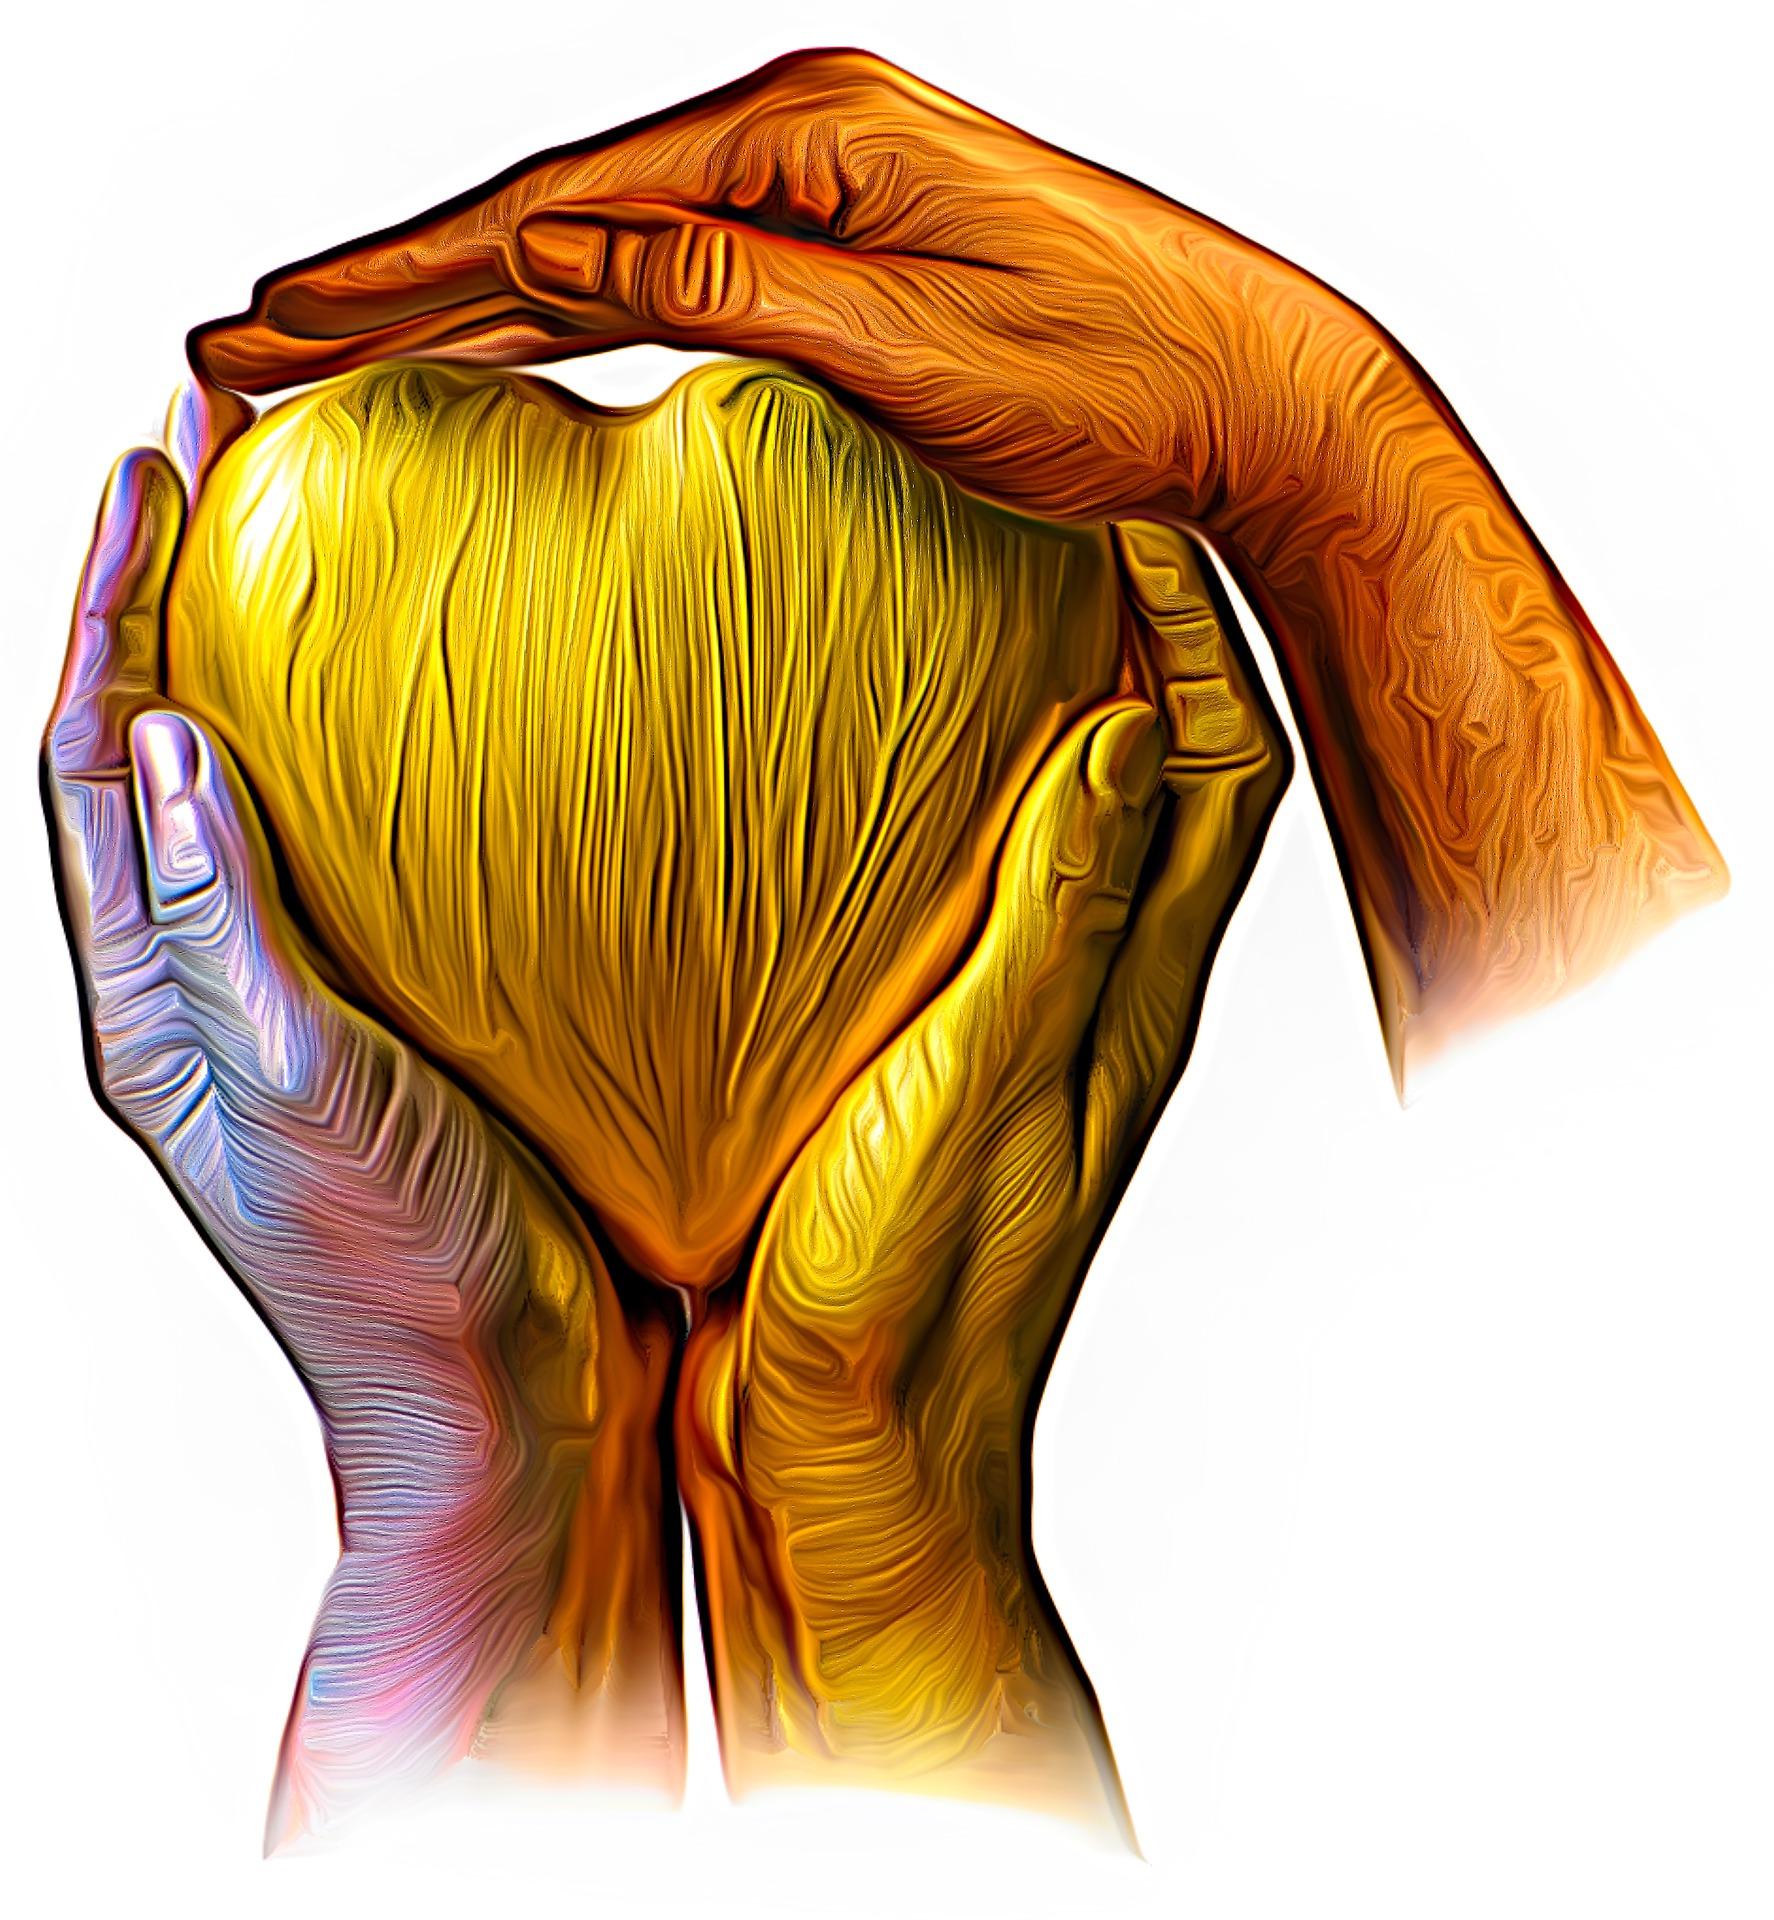 colourful image of human heart Marek Studzinski on Pixabay